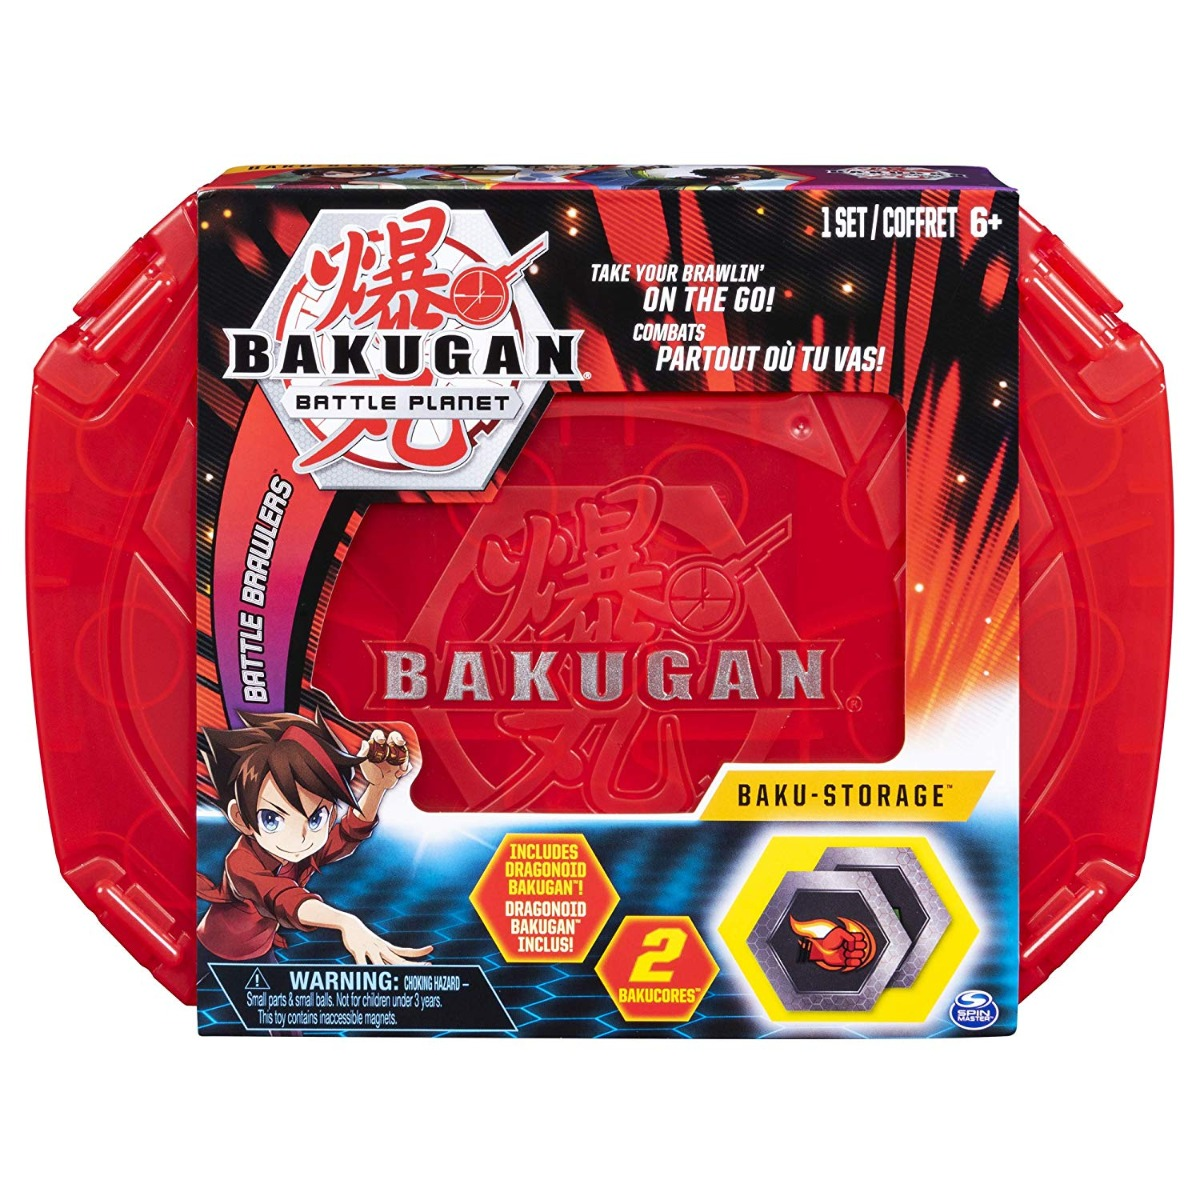 Set Baku-cutie de depozitare Bakugan Battle Planet. Red. 20104005